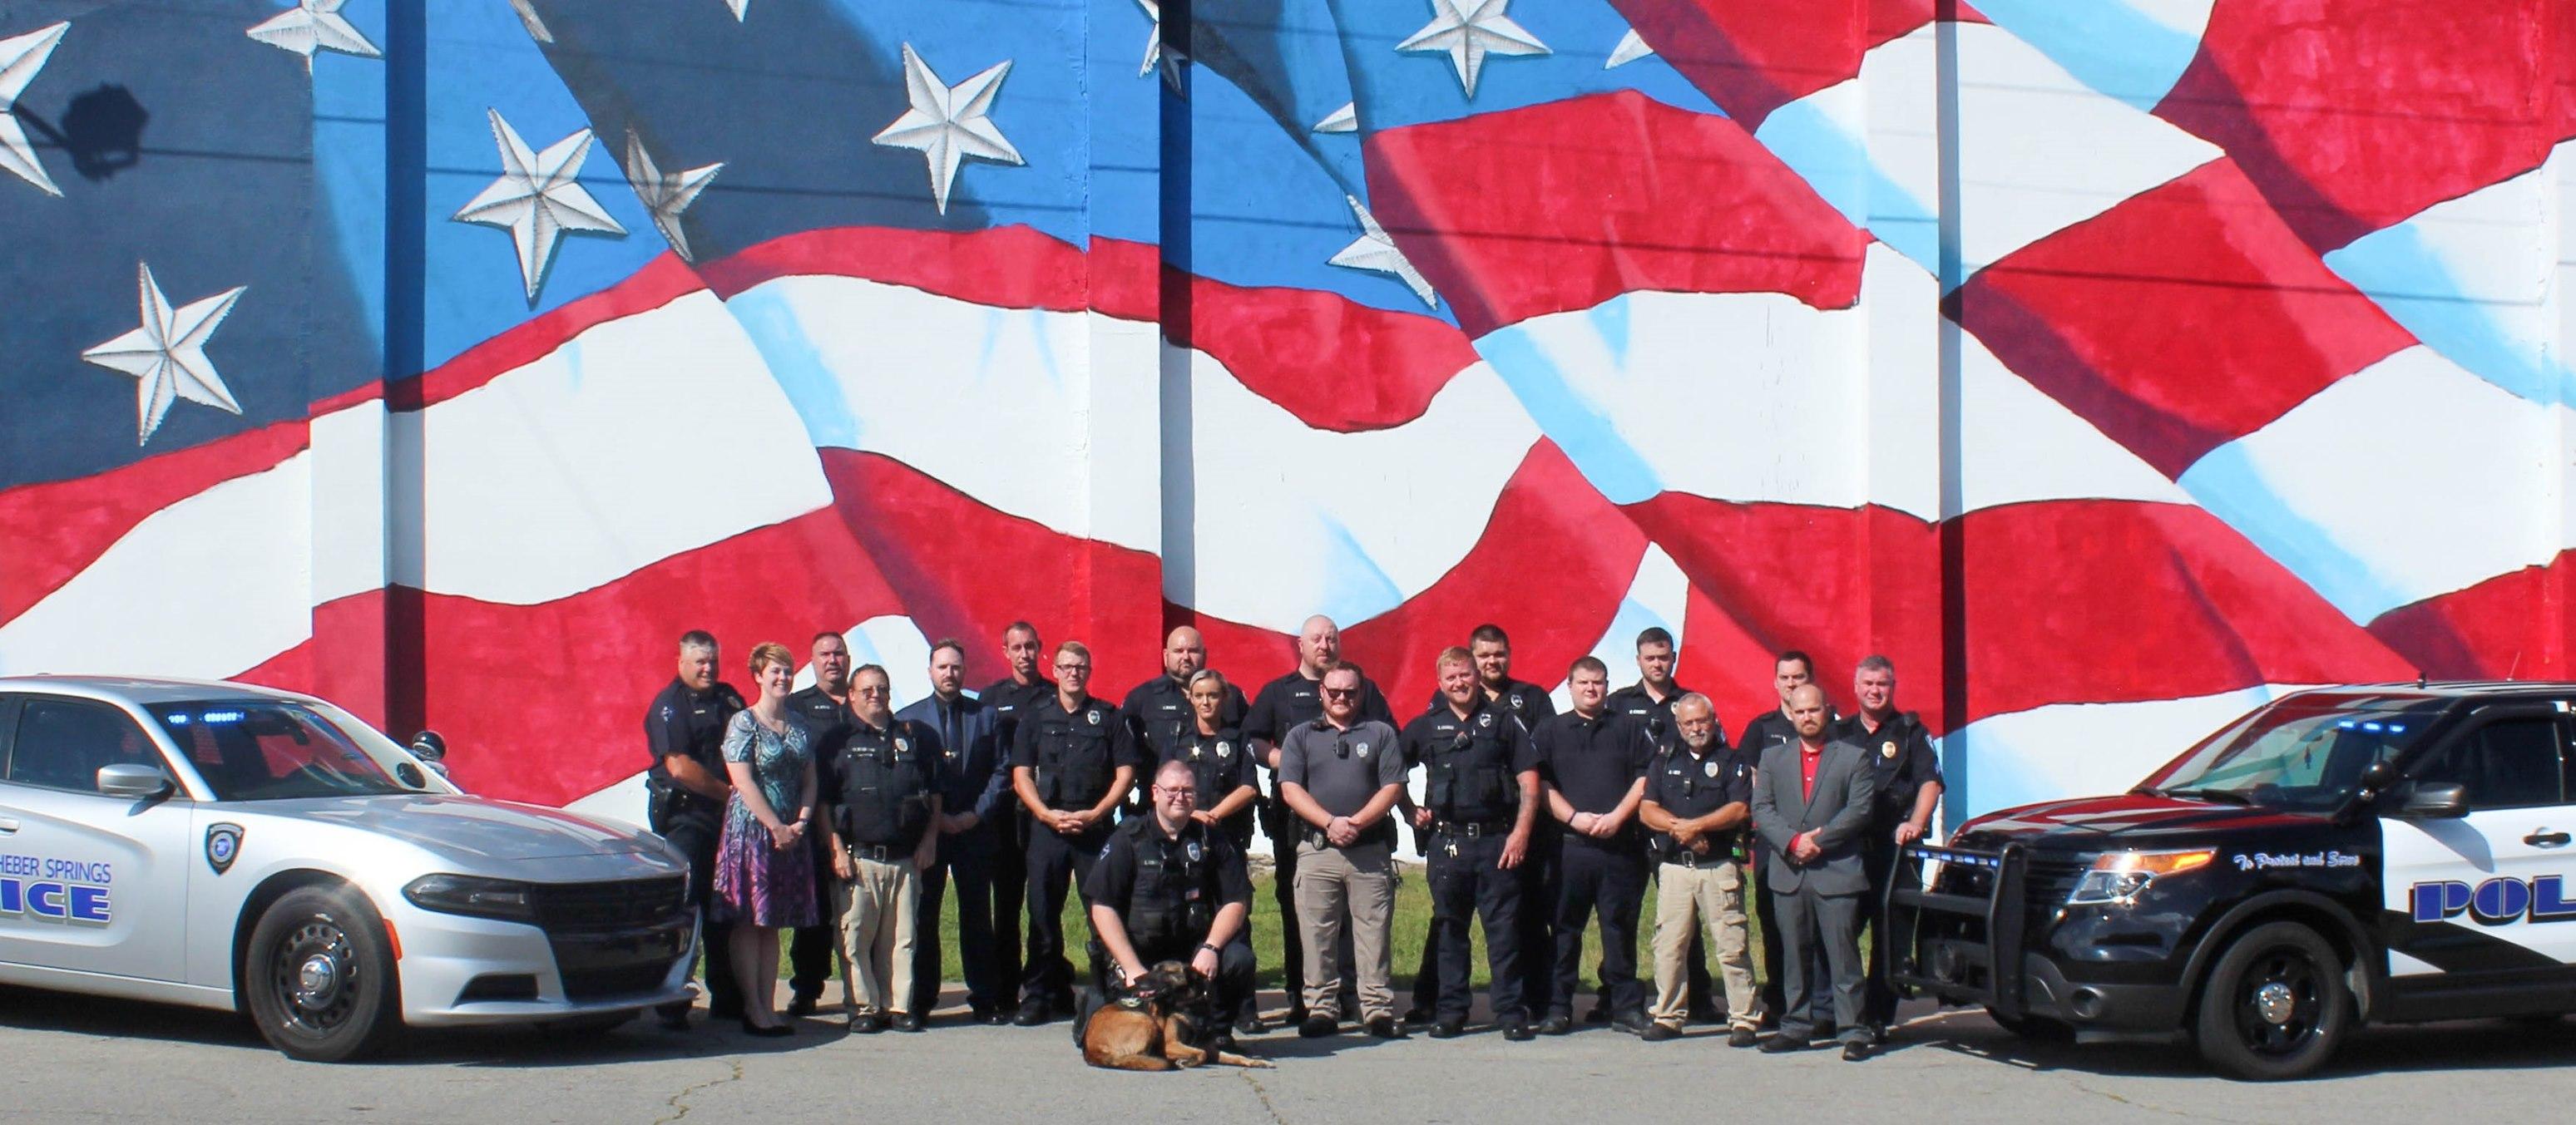 Heber Springs Police Department 2021